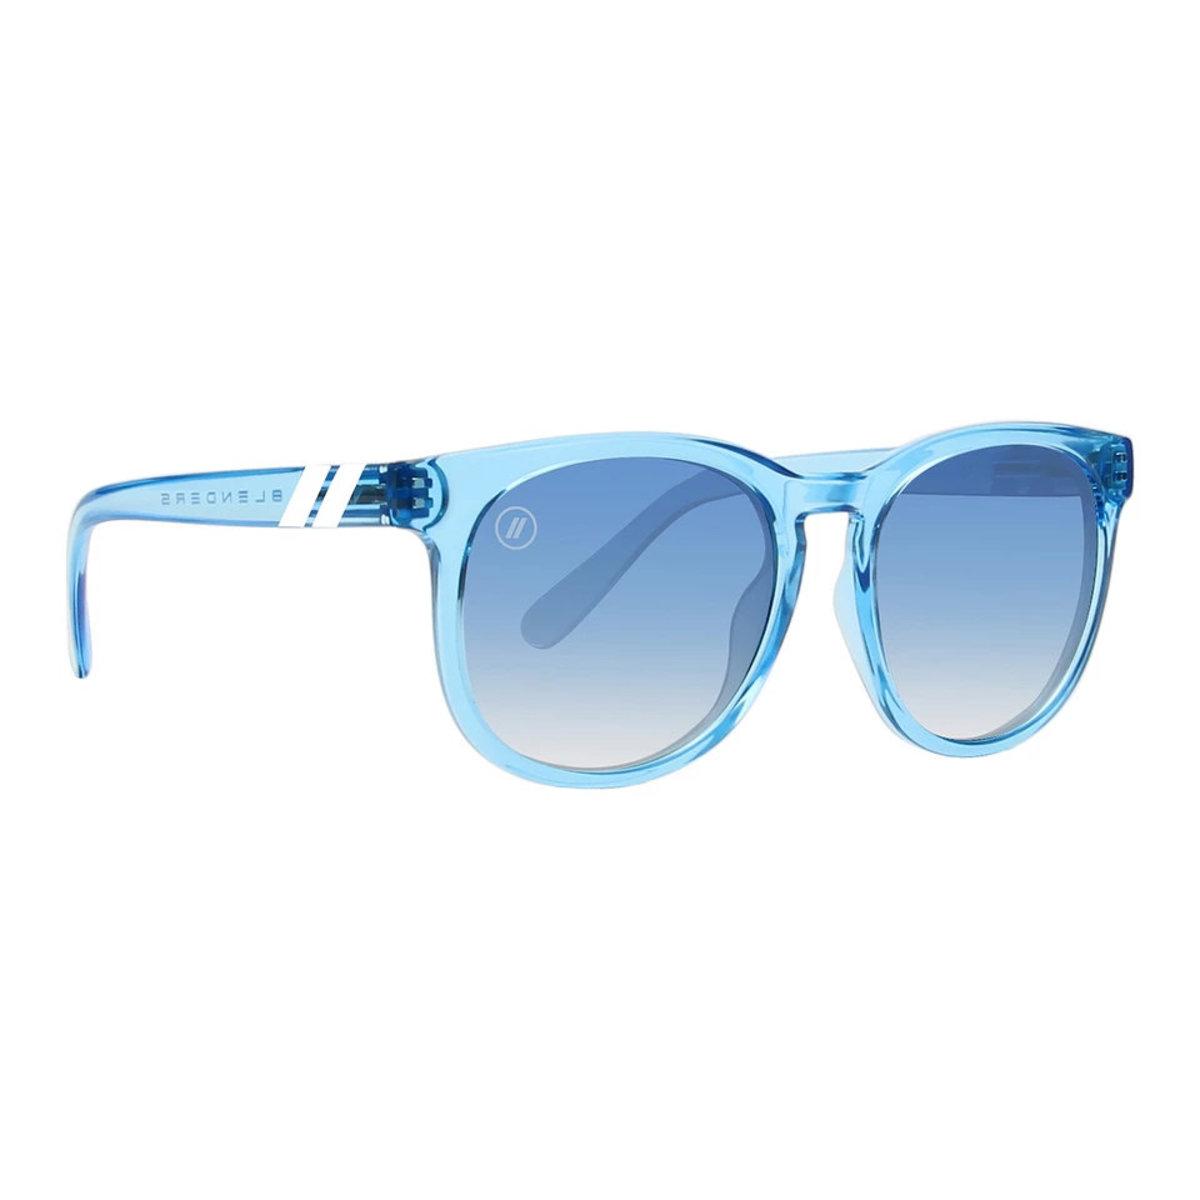 H Series // Ocean Dream Polarized Sunglasses